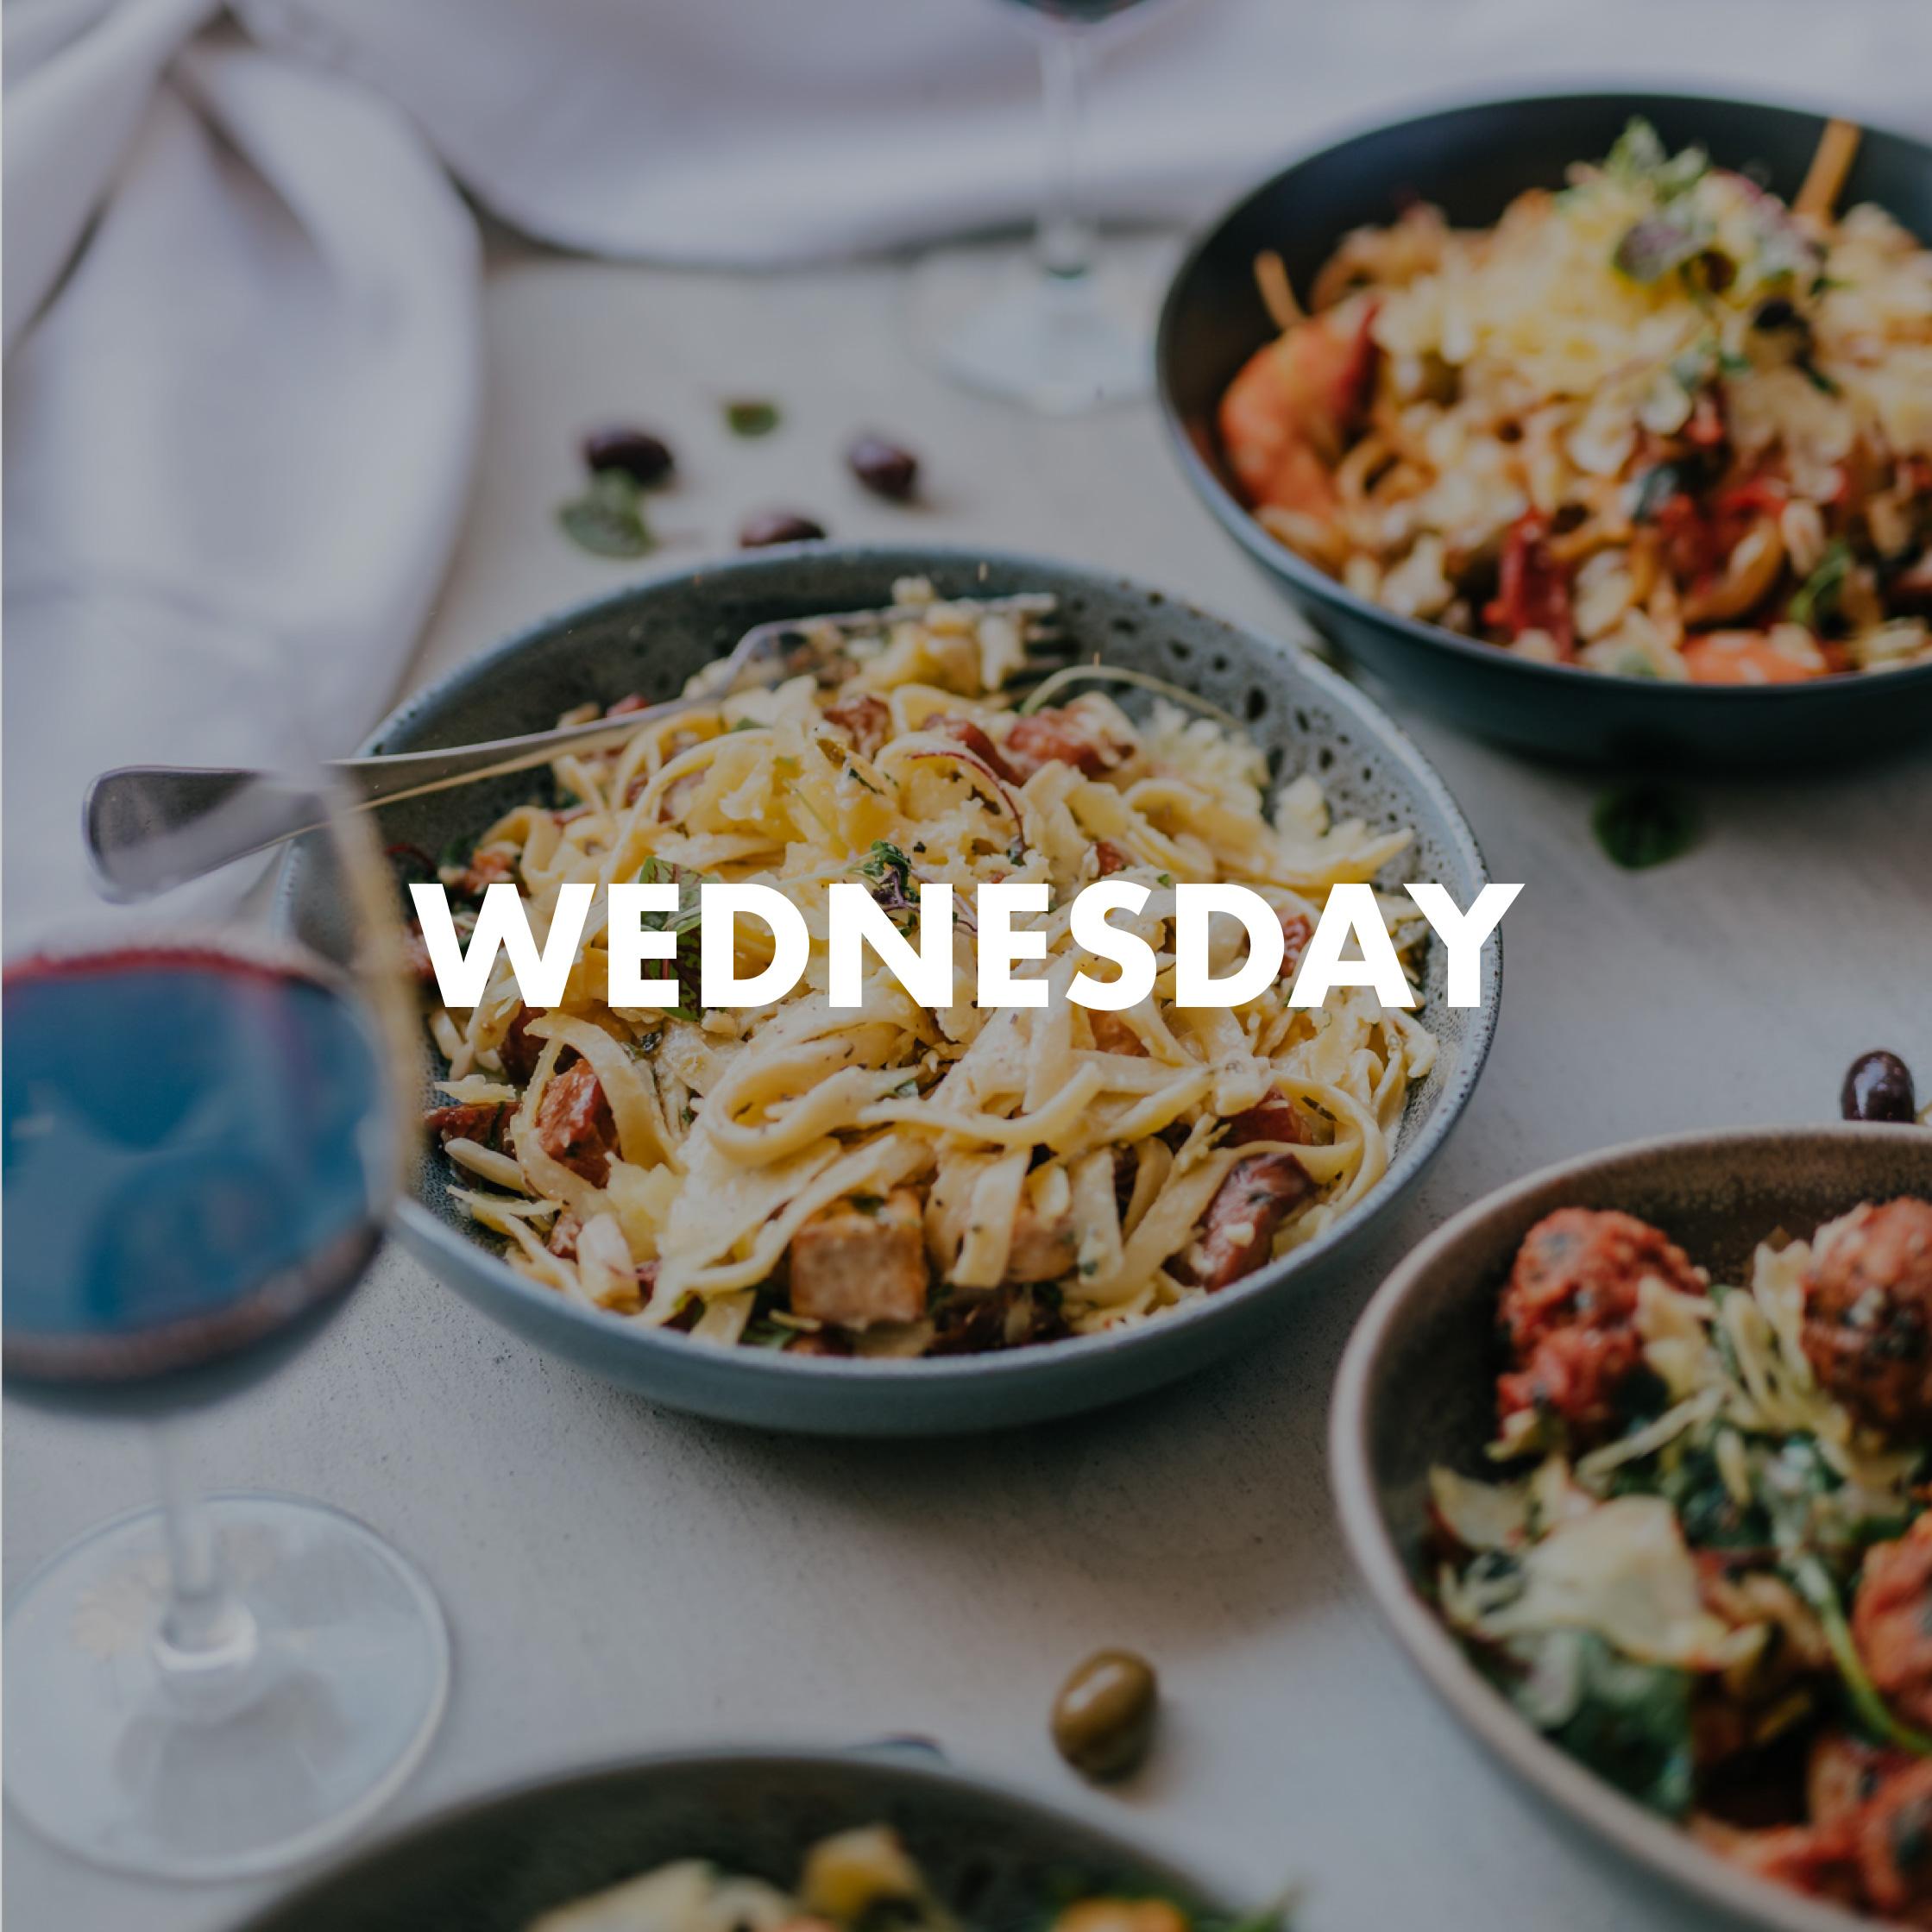 Wed Food Specials: EDGEWORTH TAVERN